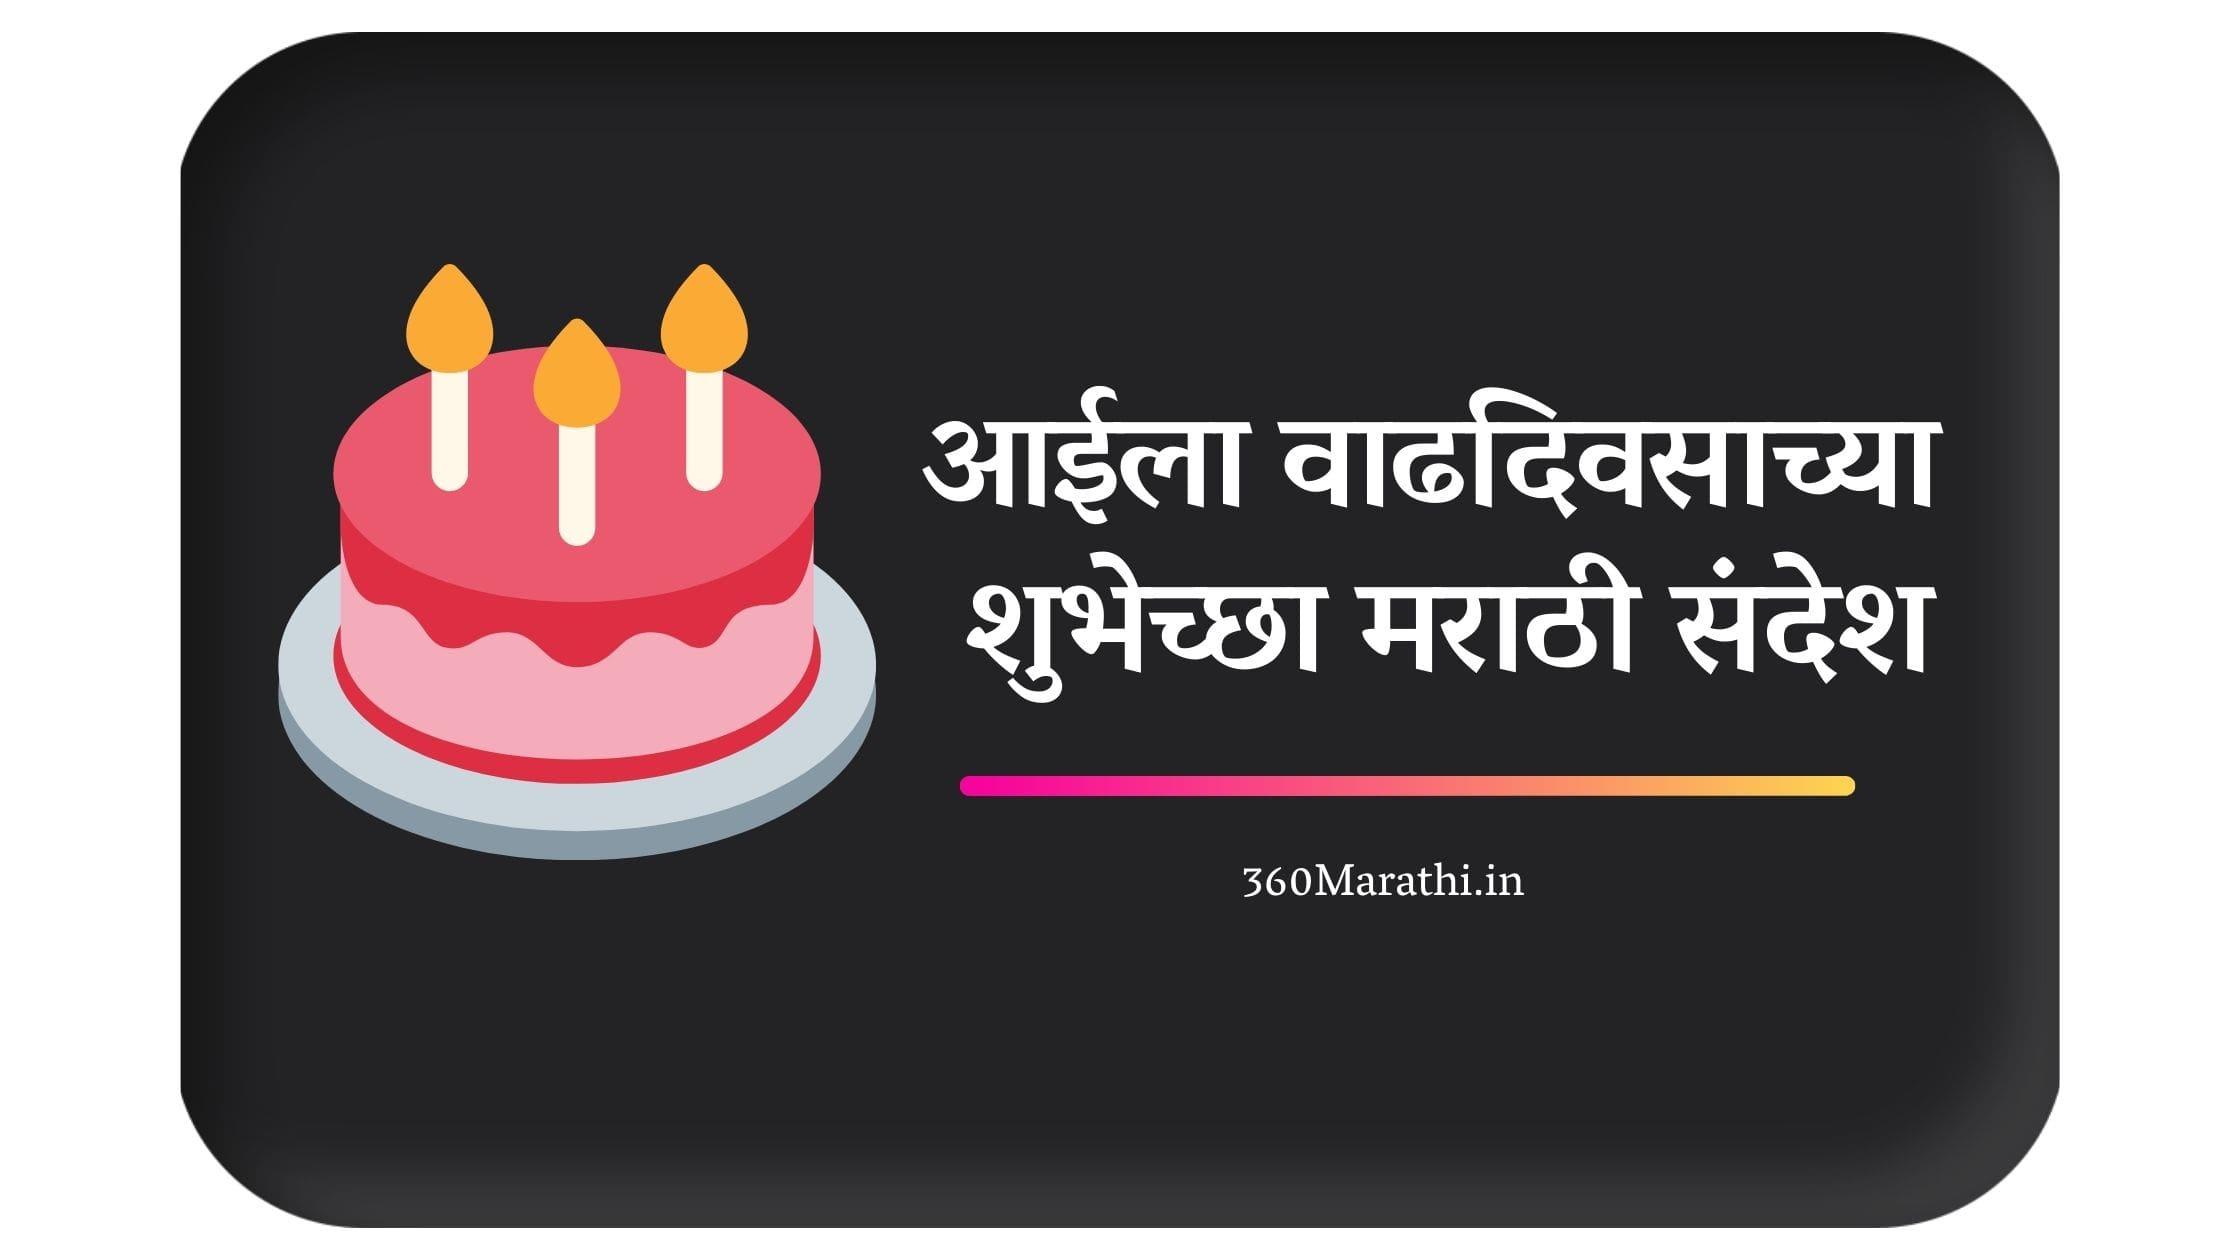 Birthday Wishes in Marathi For Mother | आईला वाढदिवसाच्या शुभेच्छा मराठी संदेश